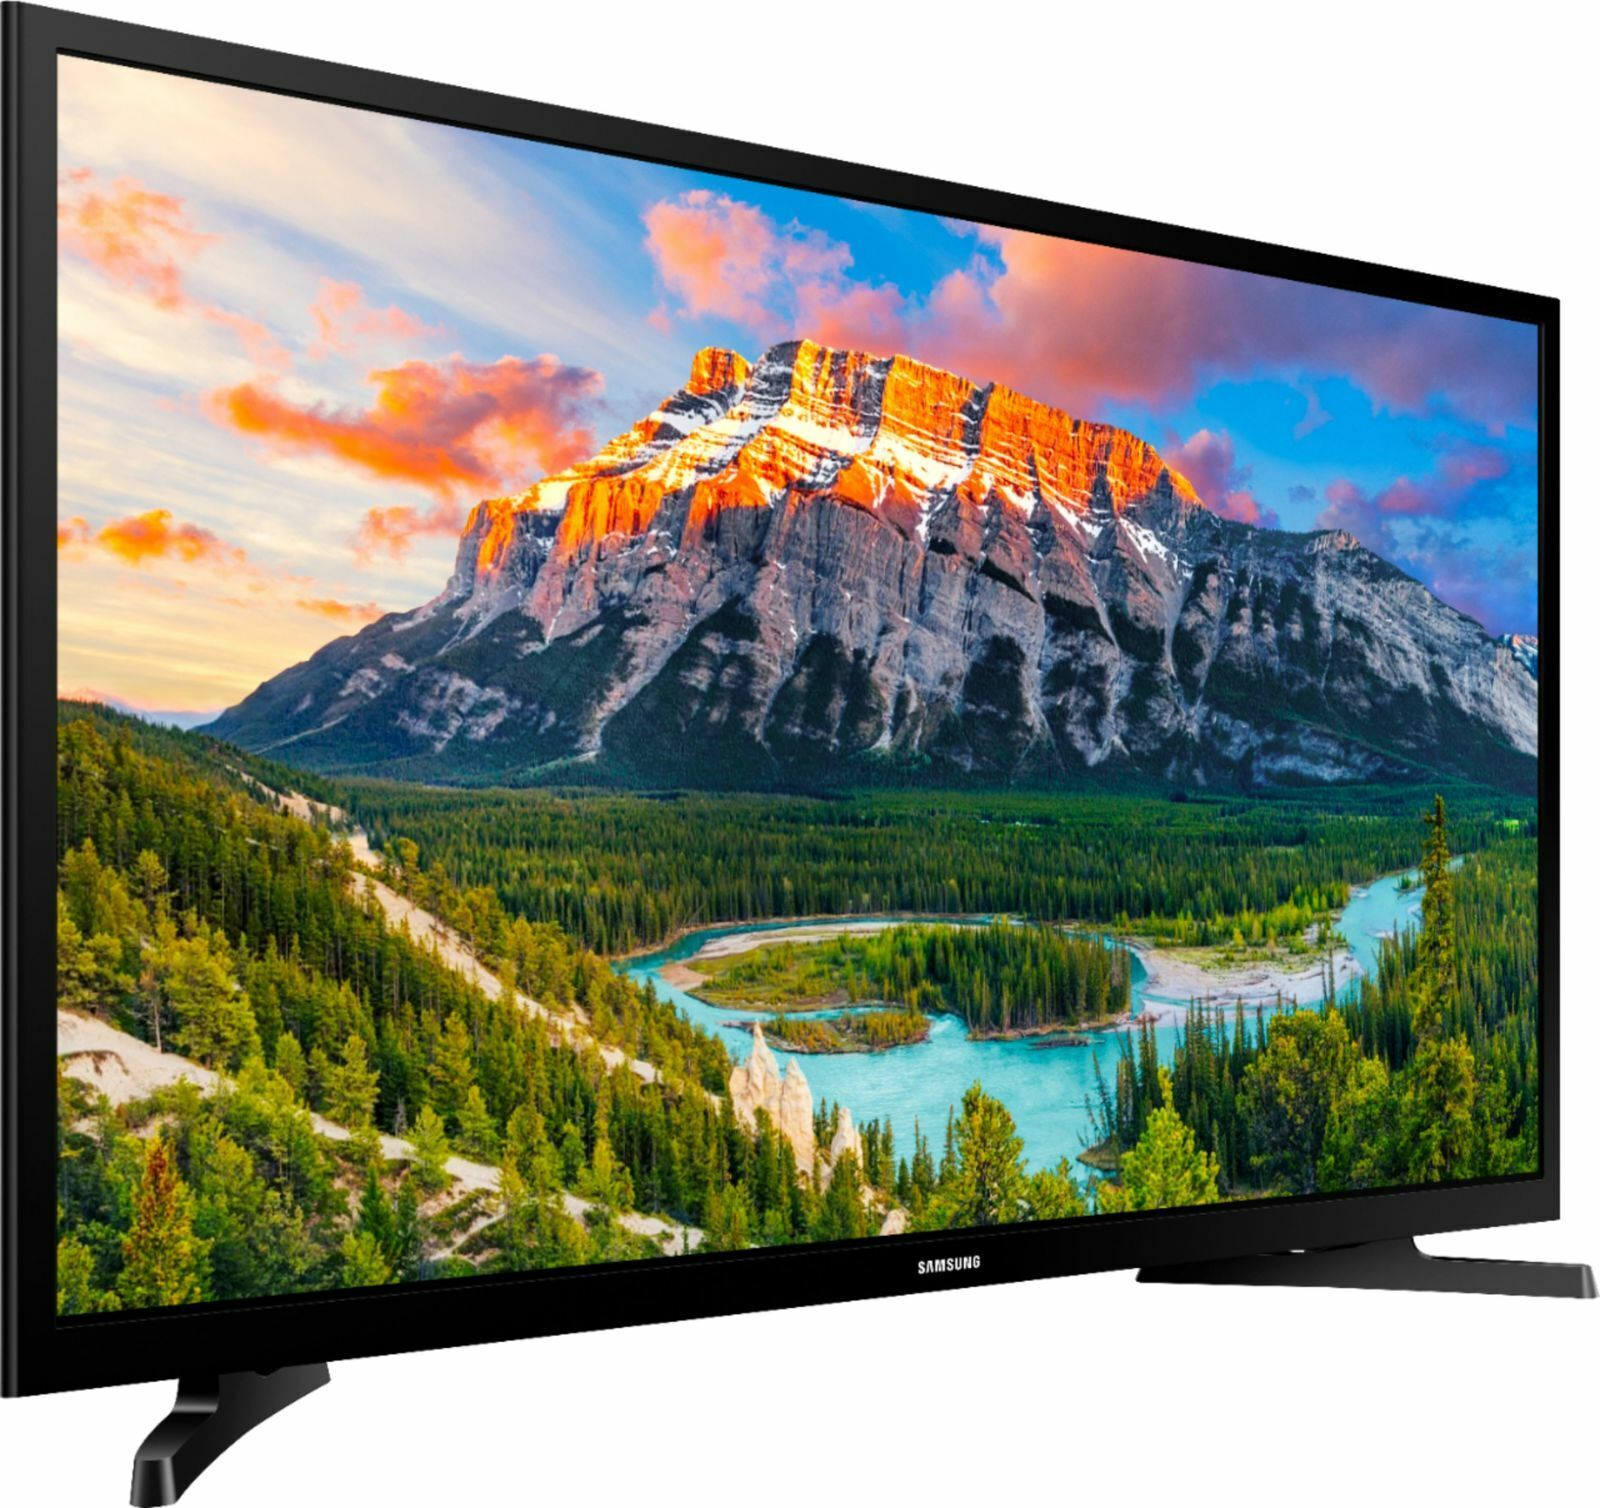 SAMSUNG 32 inch 1080p Class N5300 Series LED Smart HDTV Free